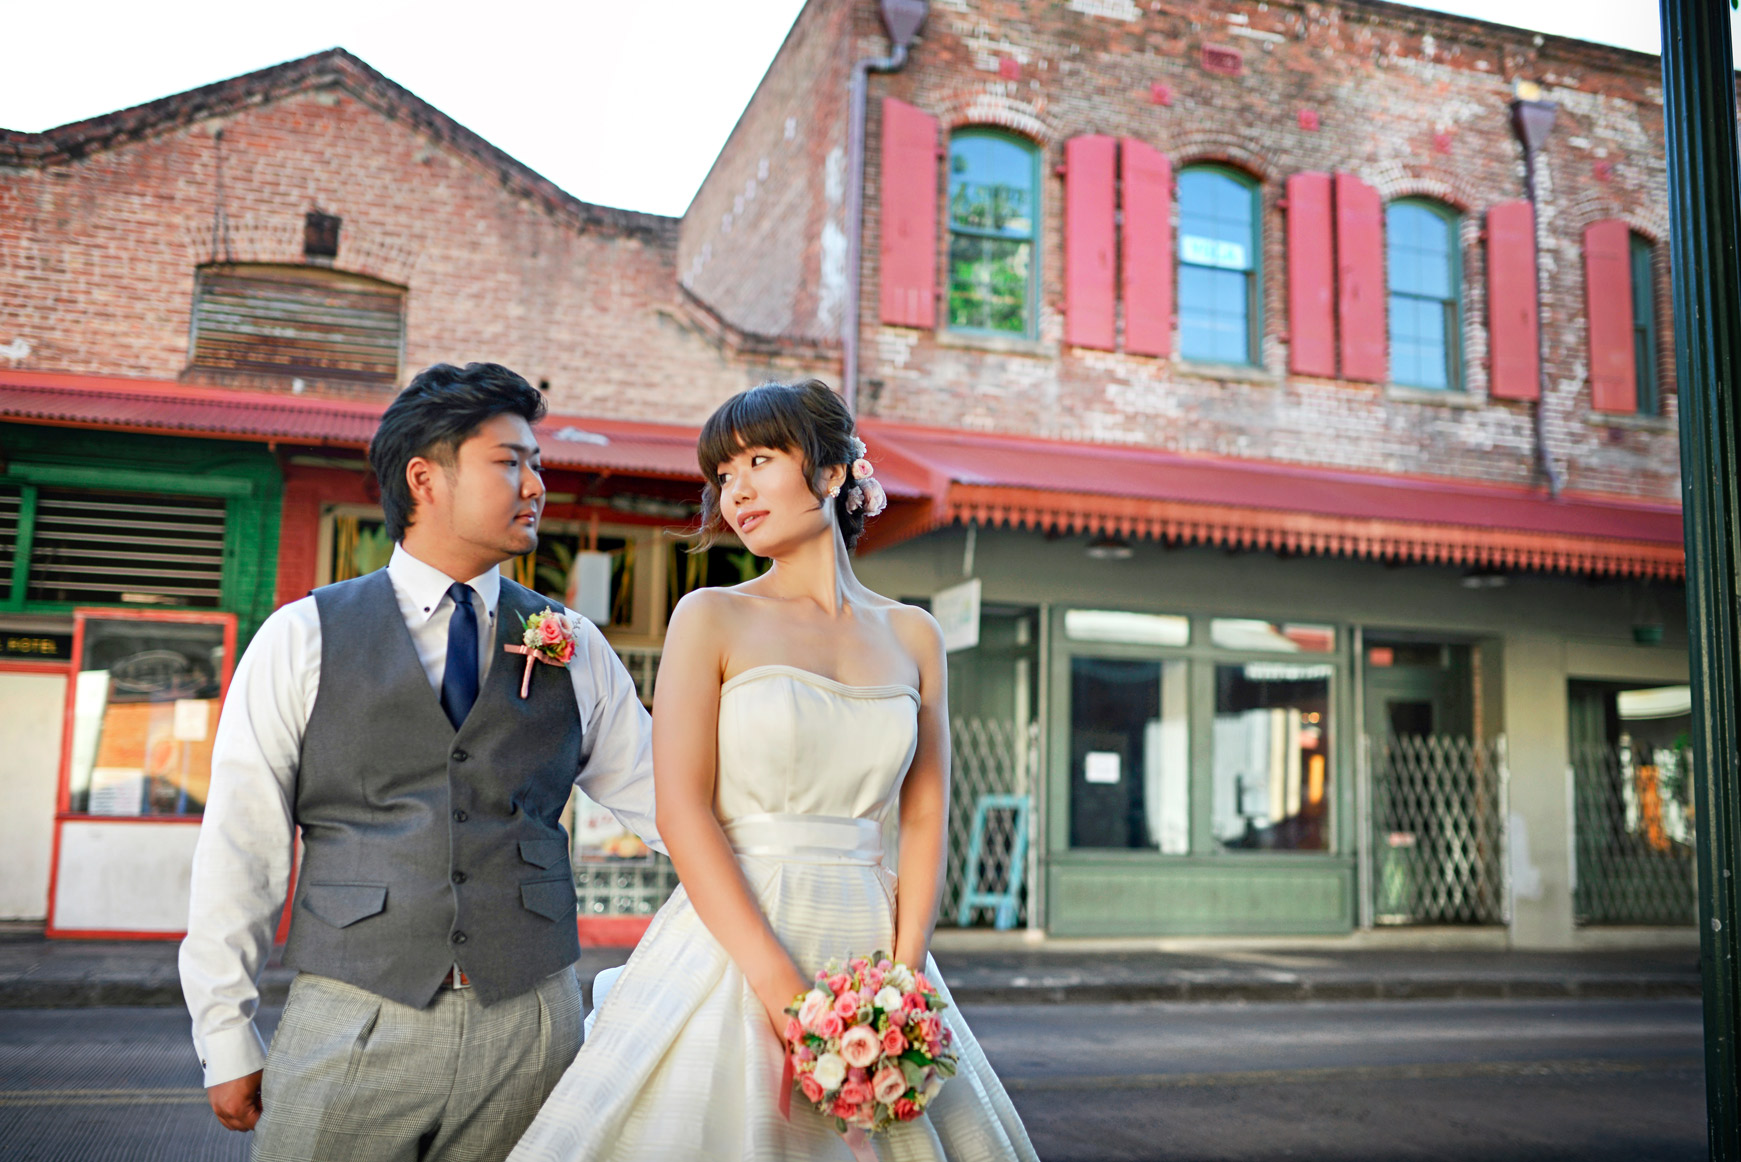 waikiki-beach-wedding-and-downtown-honolulu-hawaii-theater-stephen-ludwig-photography185.jpg